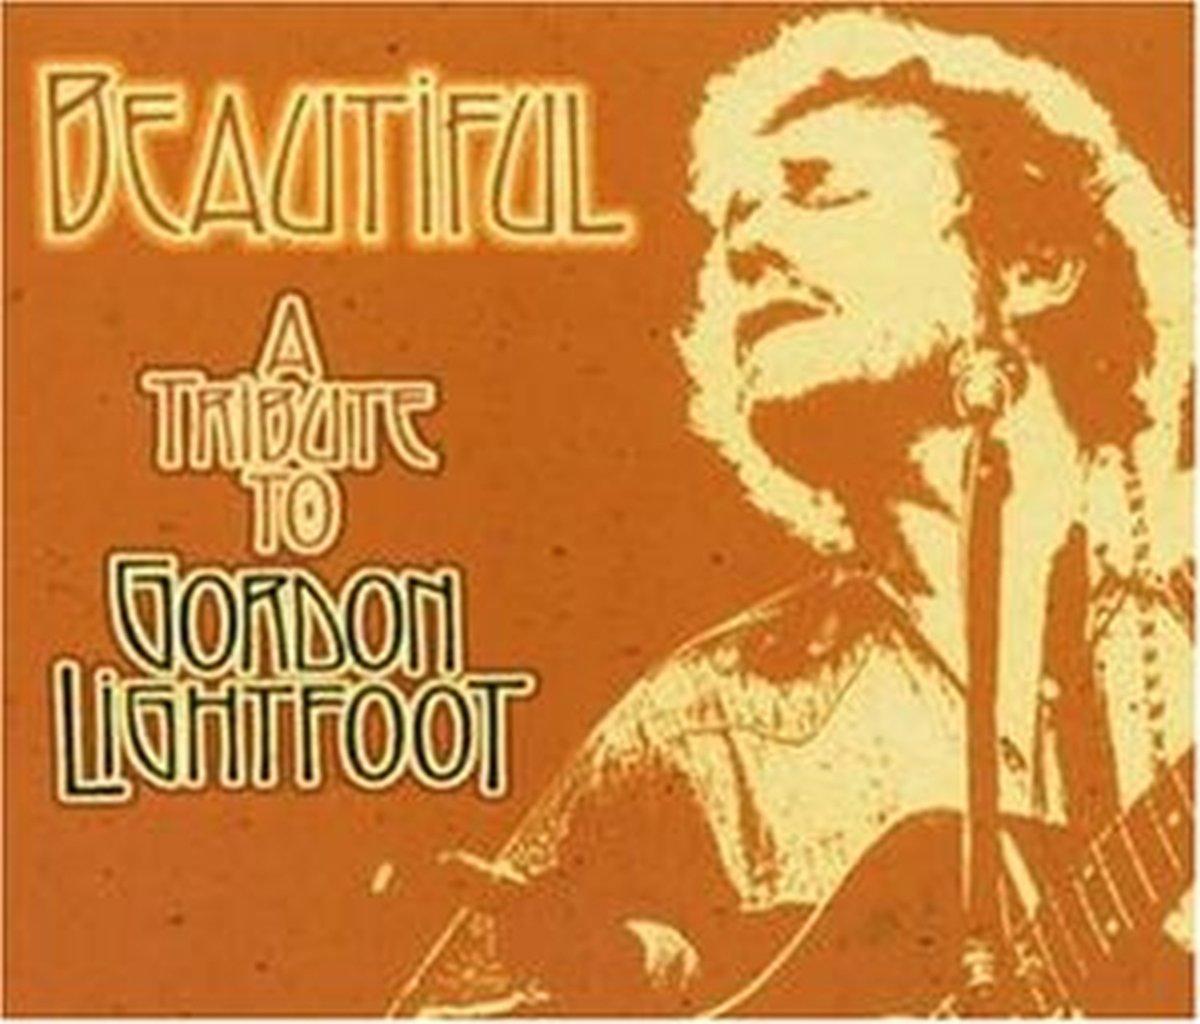 VA - Beautiful A Tribute To Gordon Lightfoot (2003) [FLAC] Download